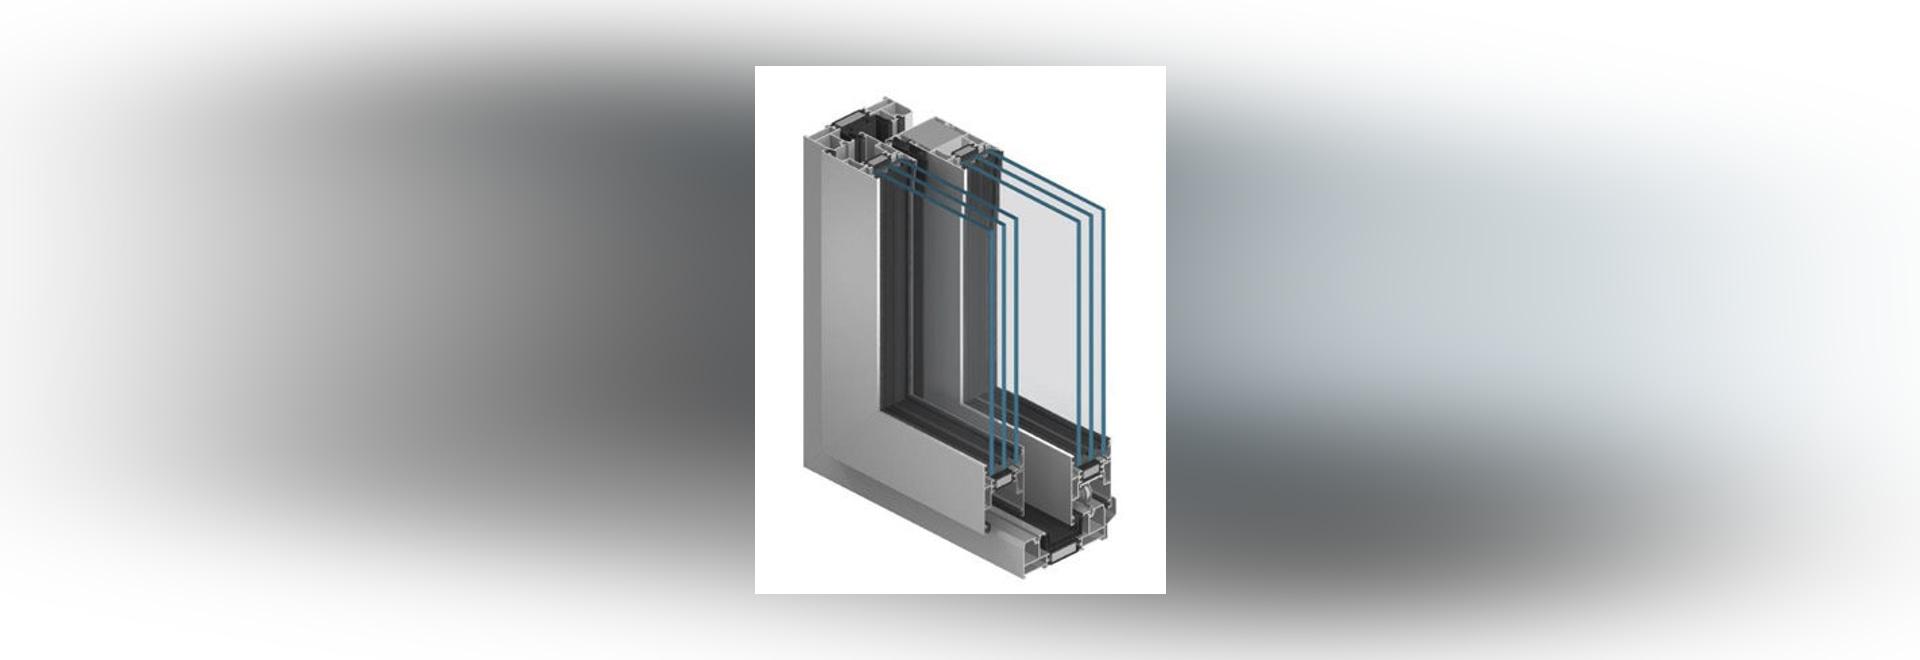 NEW: aluminum door profile by Aluprof S.A